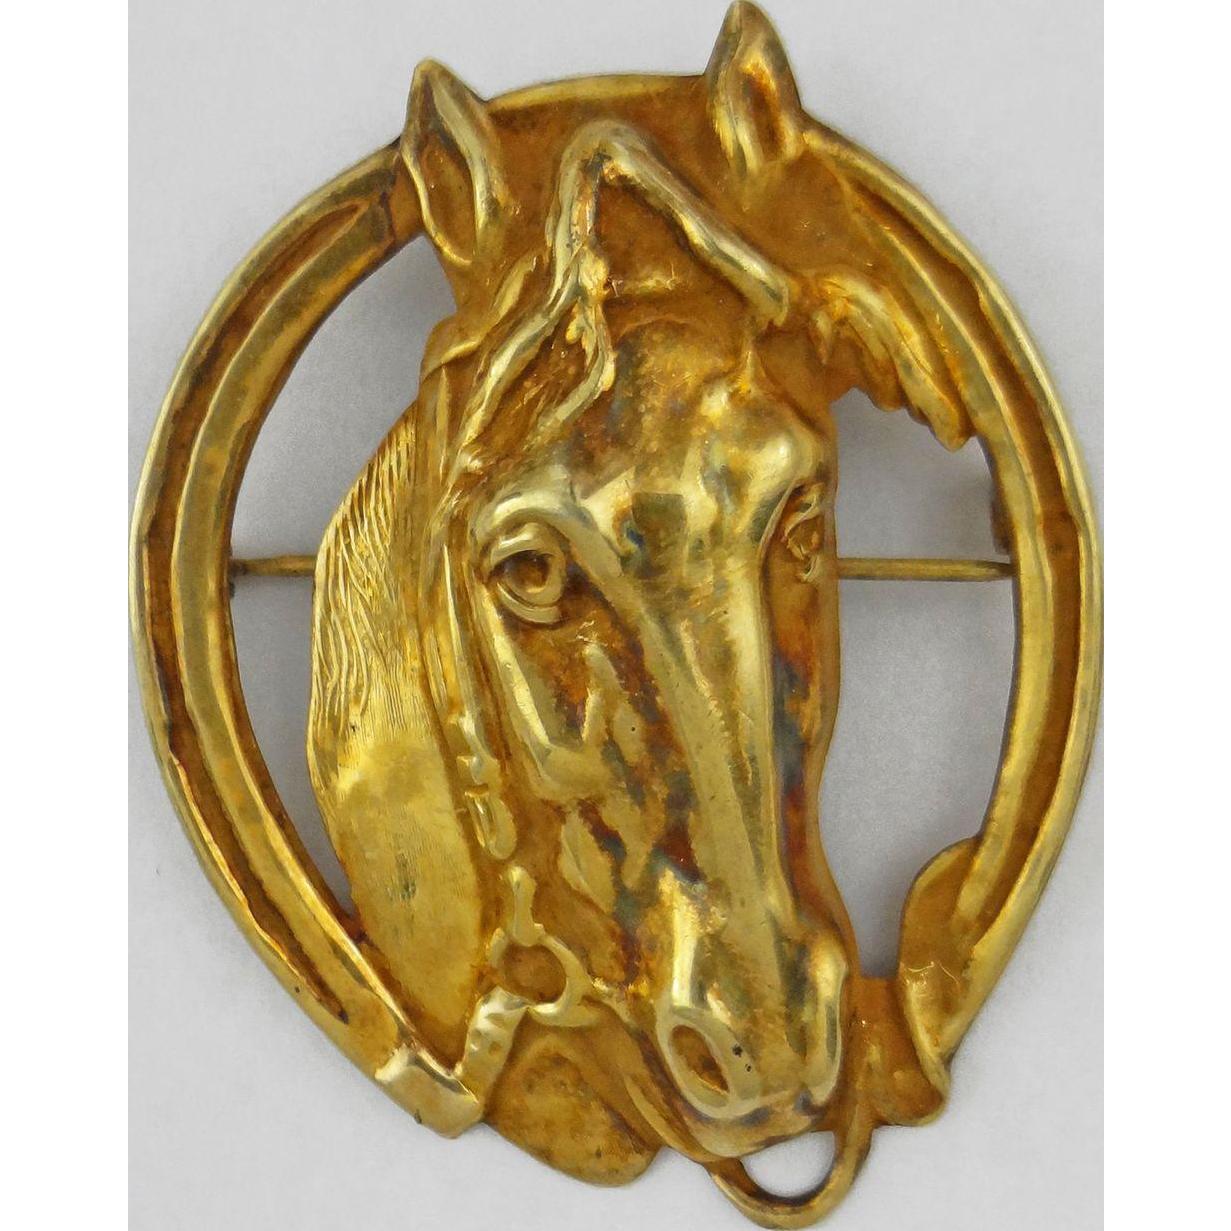 Gilt Sterling Horse / Equestrian Brooch Marked STERLING